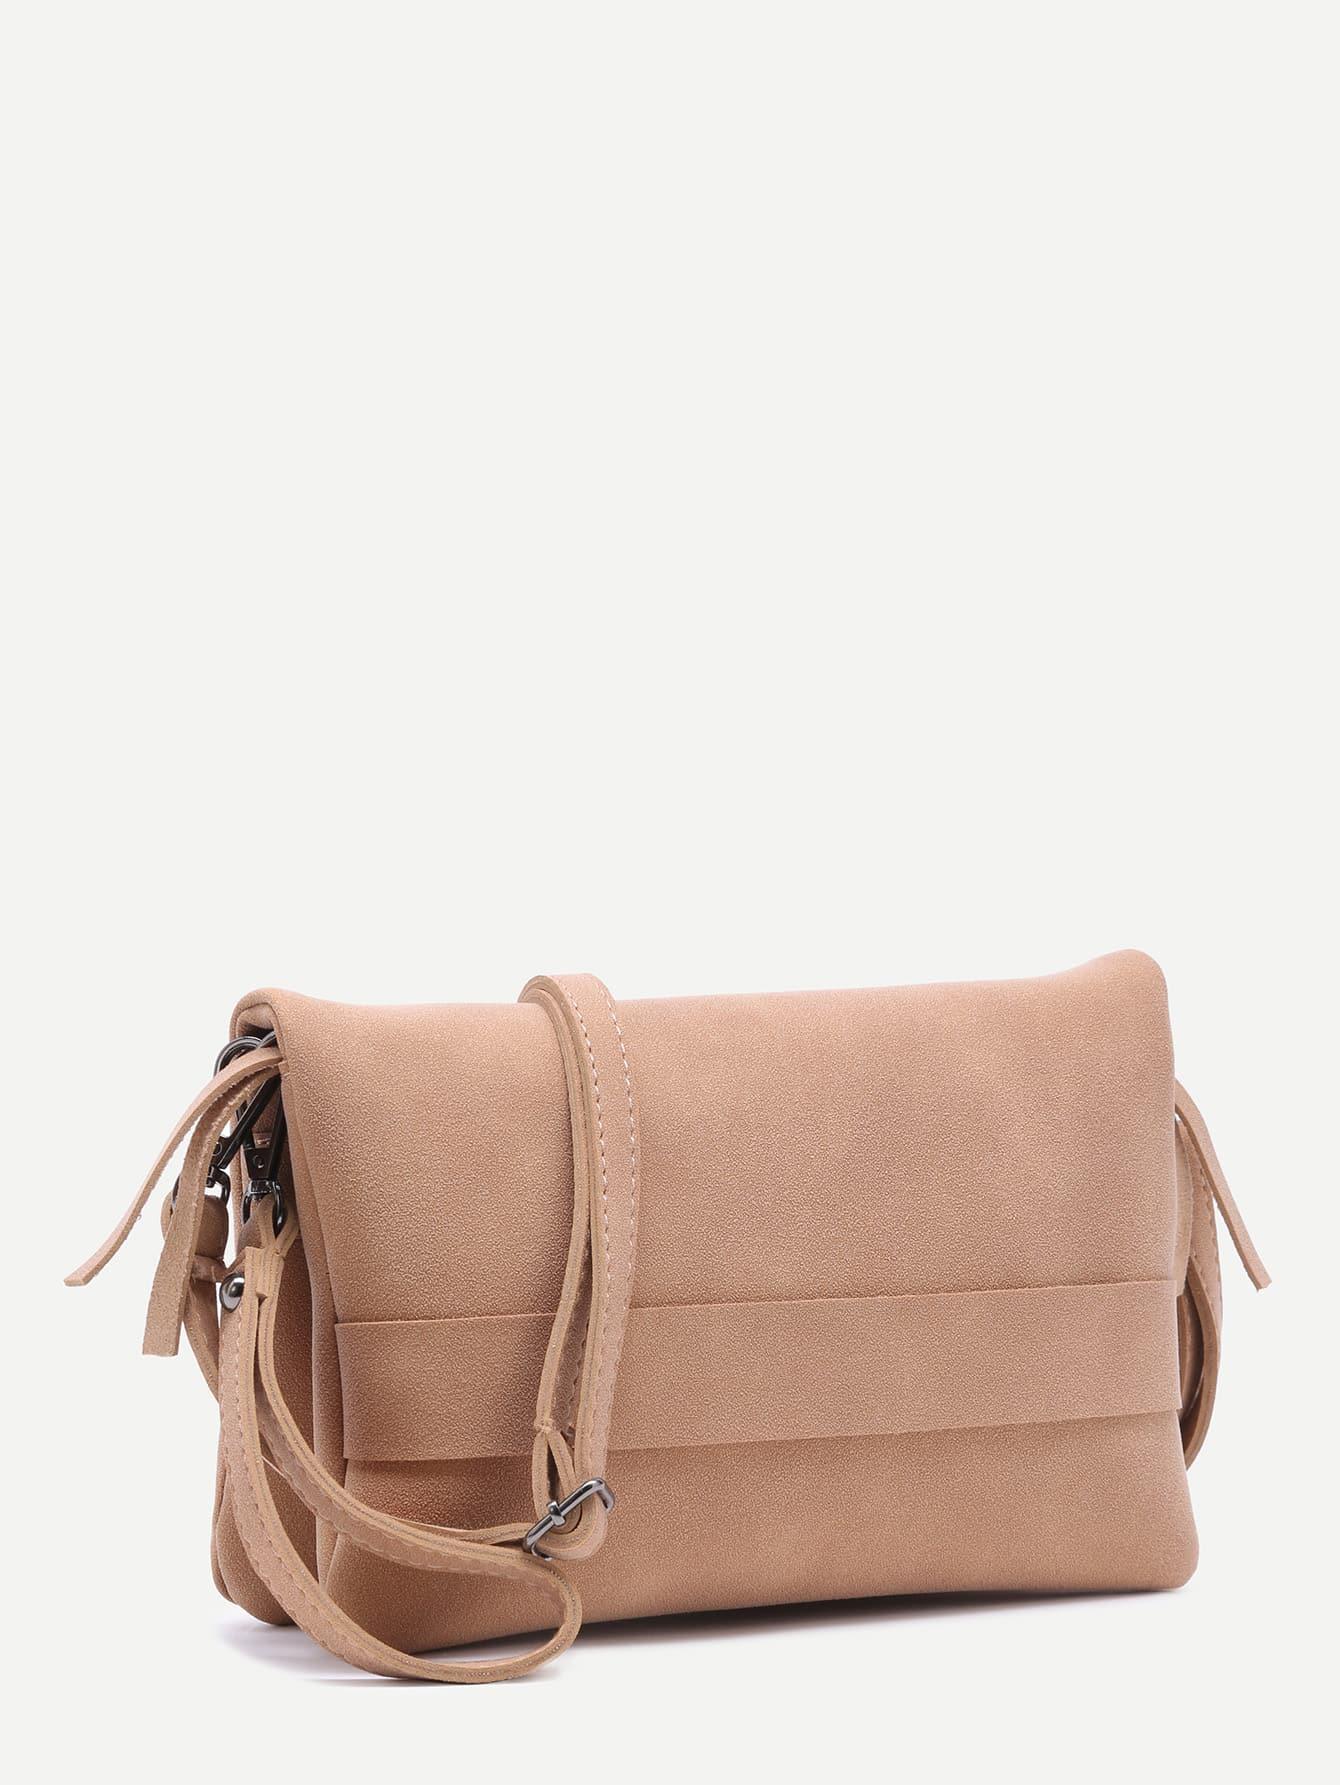 bag161031904_2